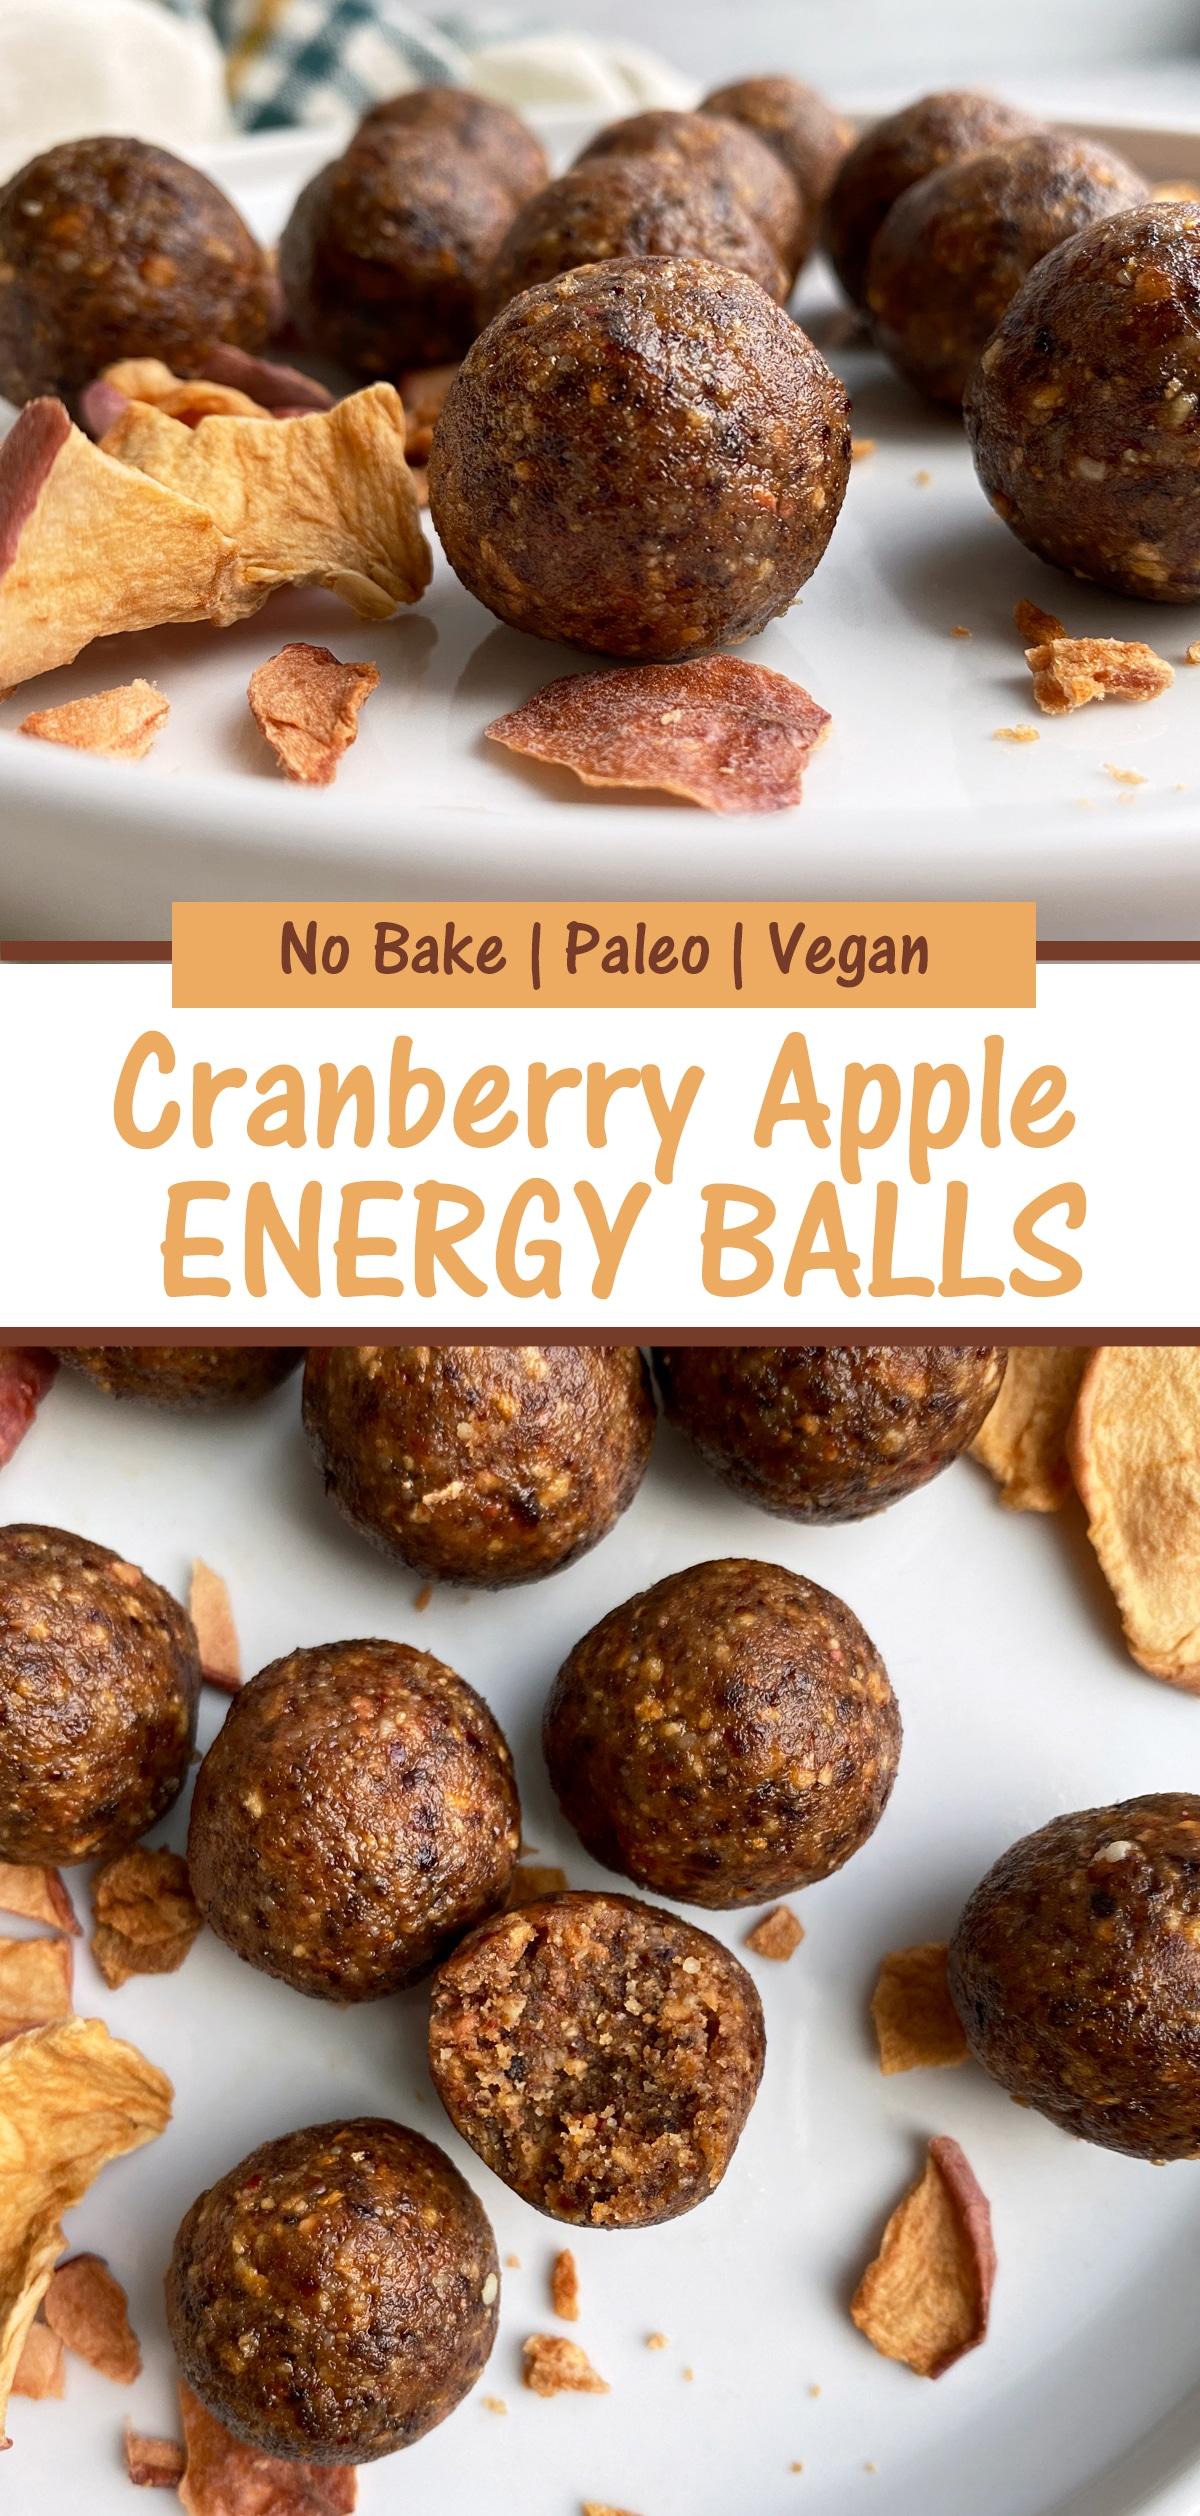 Cranberry-Apple-Energy-Balls-recipe